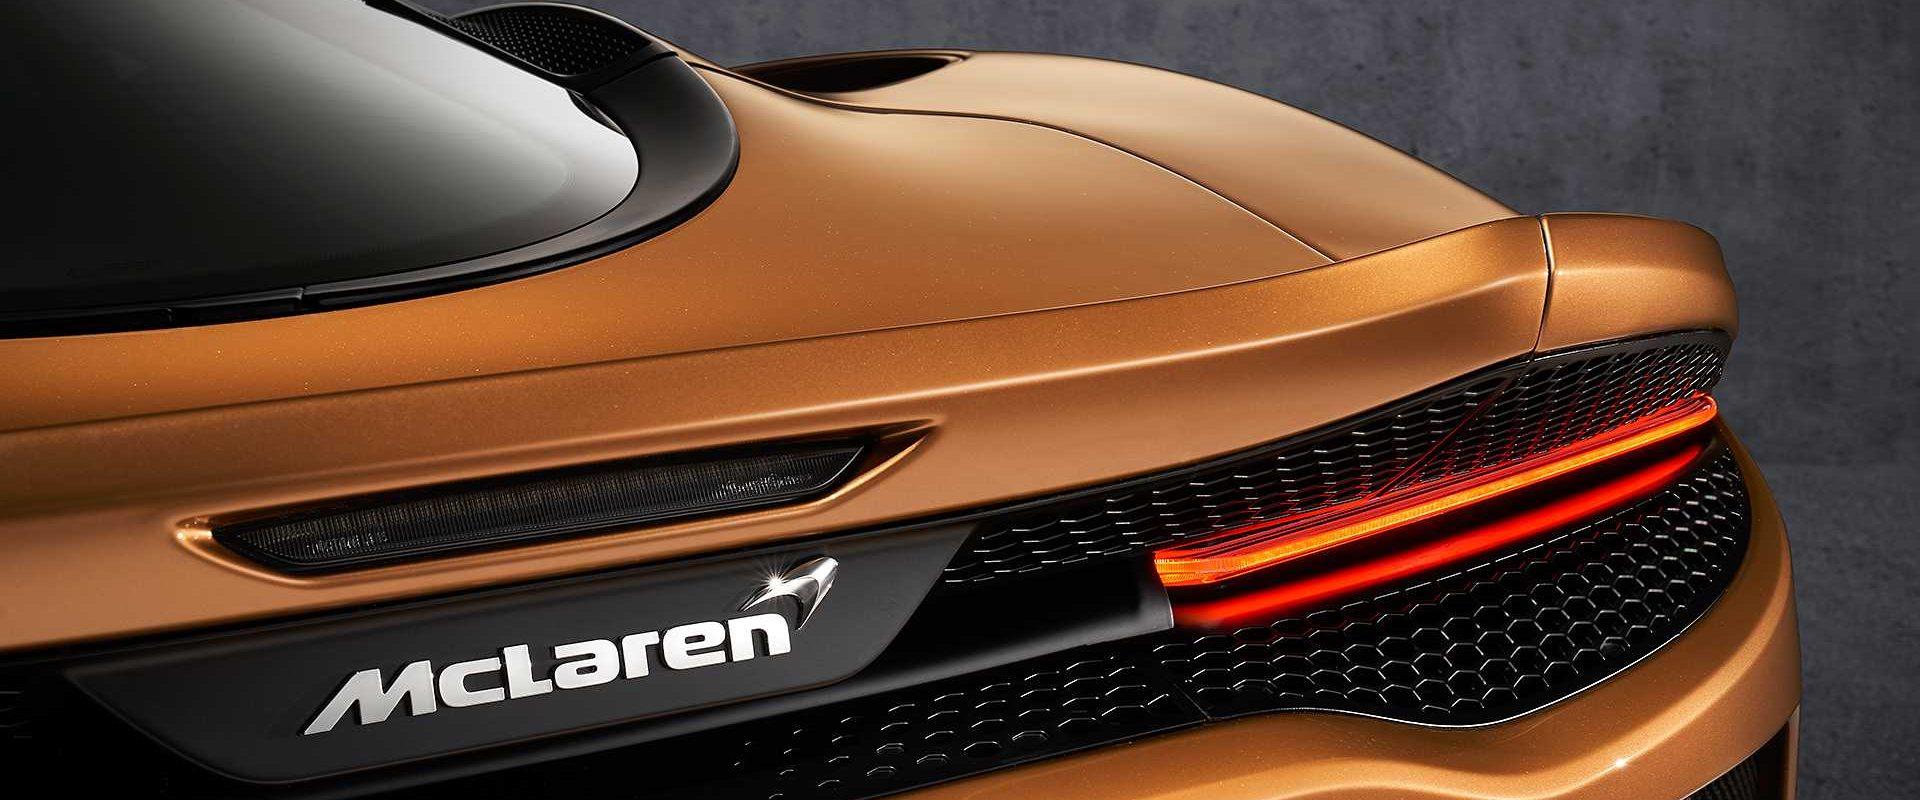 Qual é o futuro da McLaren?